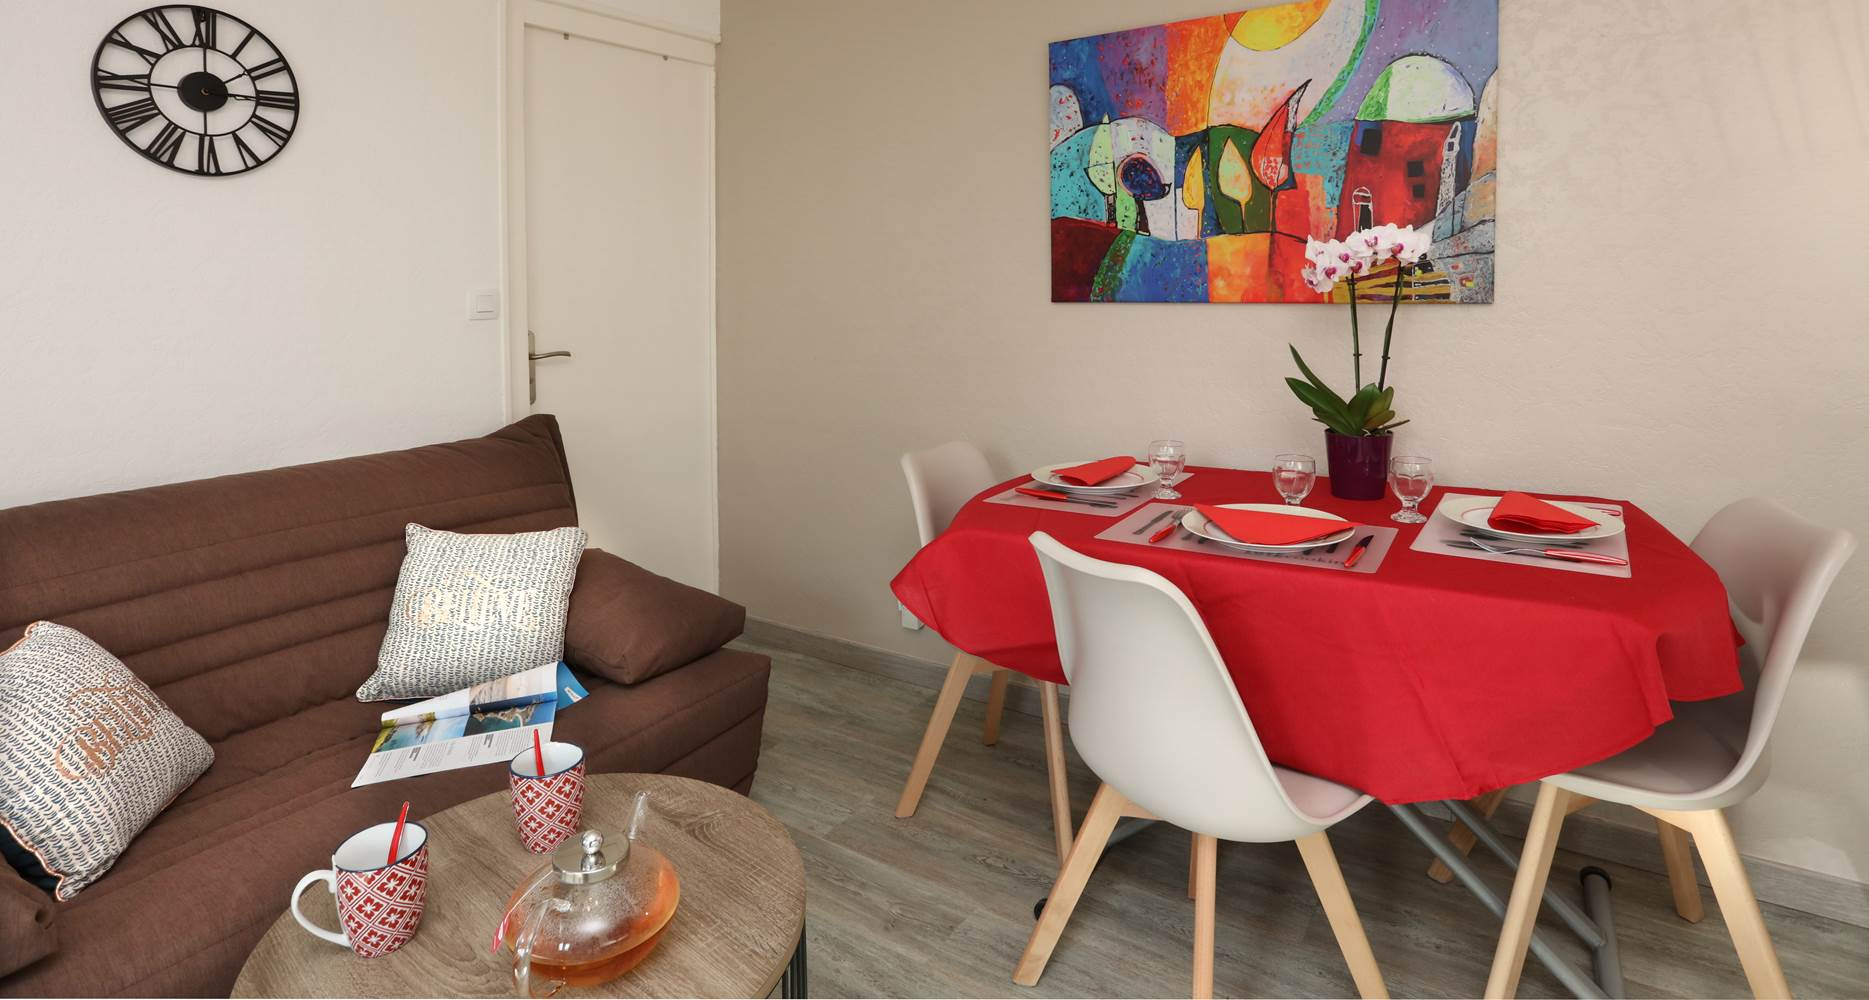 LE MELEDO Nelly - Appartement 2 personnes -Quiberon-Morbihan -Bretagne sud © LE MELEDO Nelly -